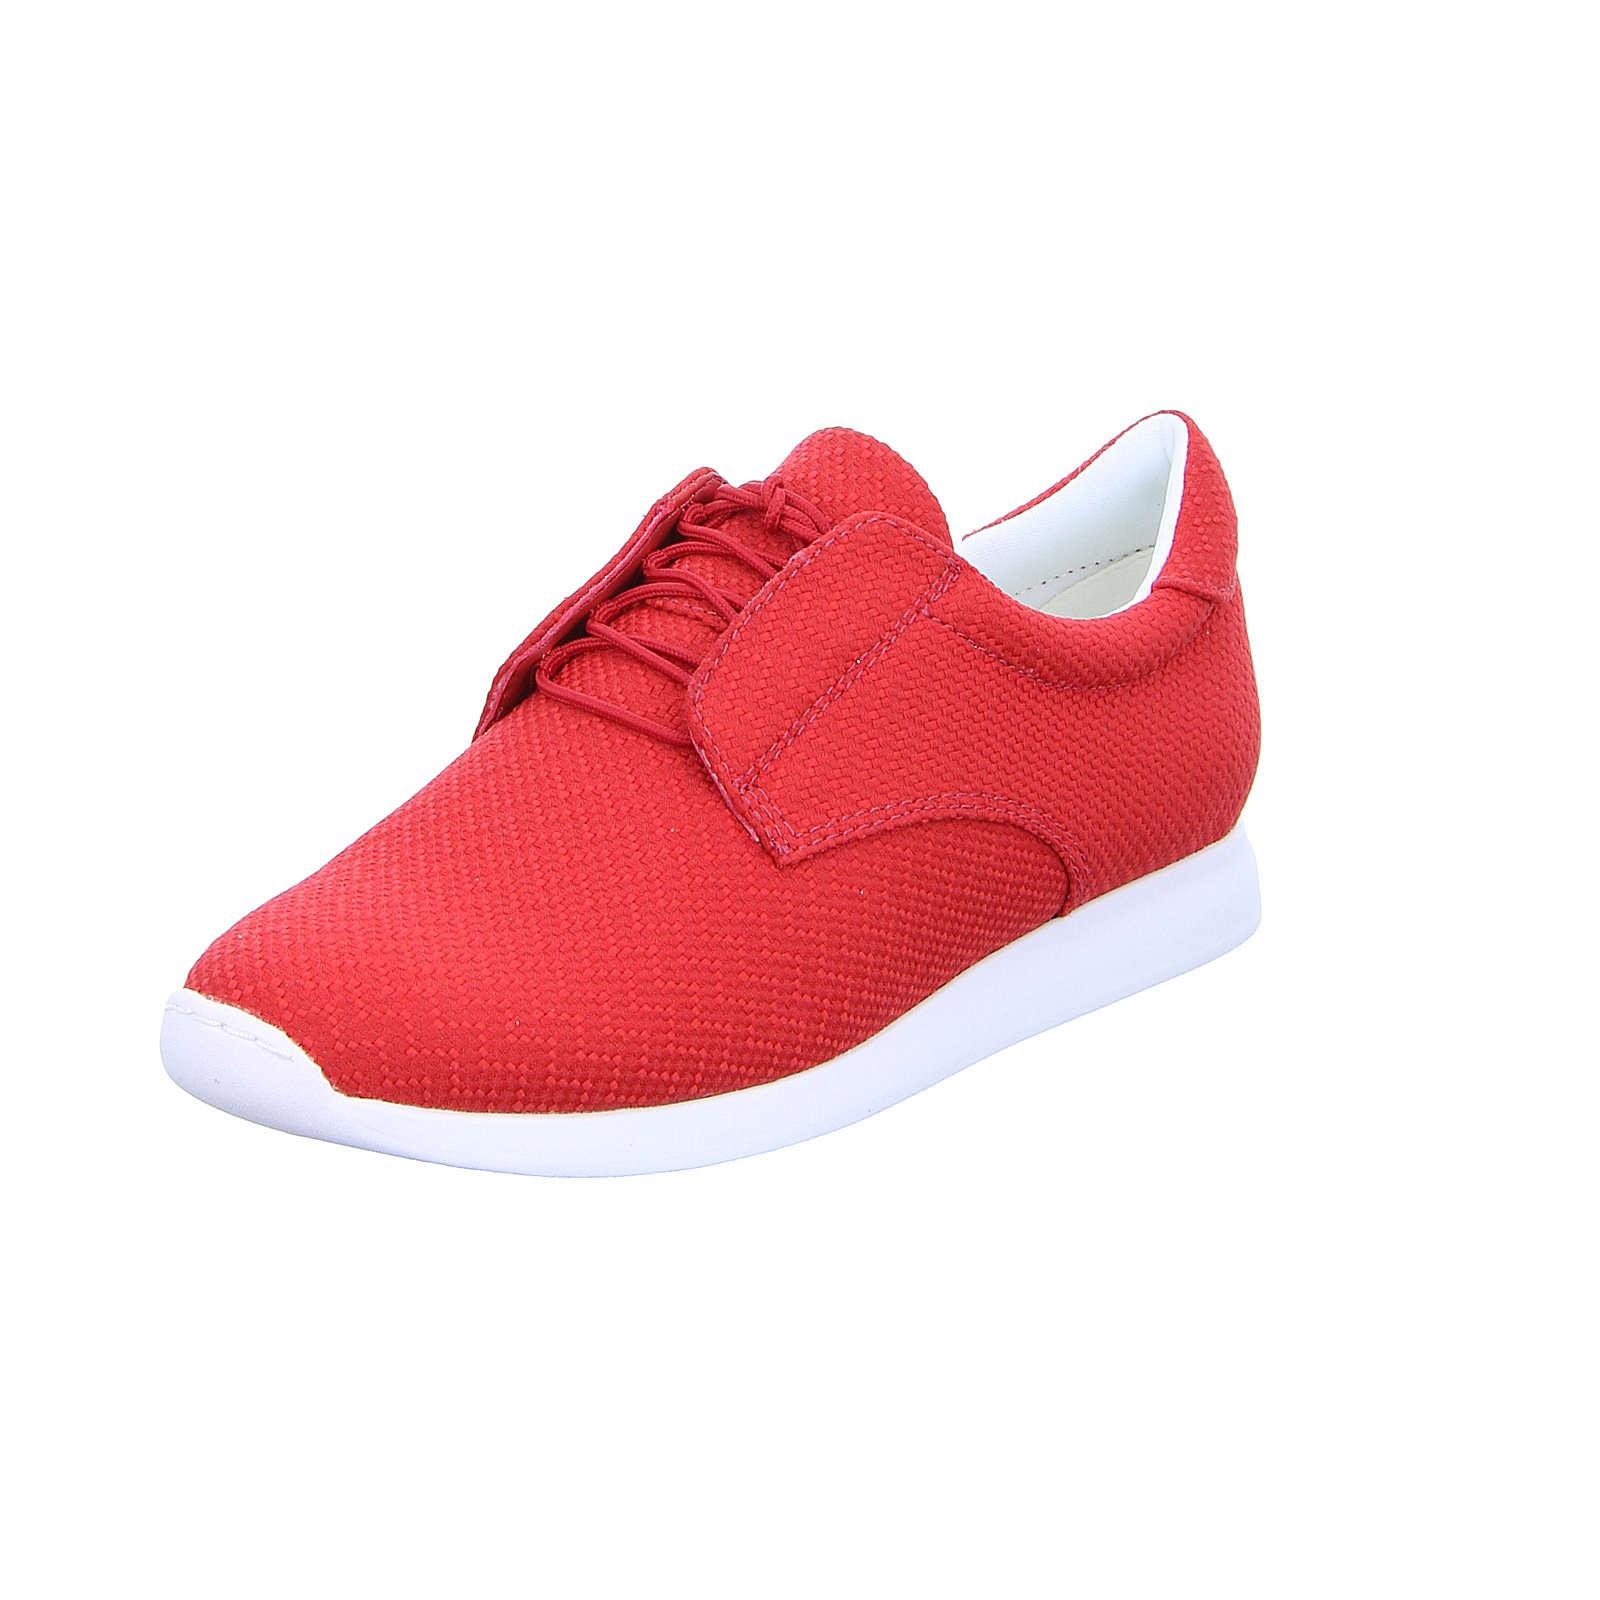 VAGABOND Kasai 2.0 Sneakers Low rot Damen Gr. 36